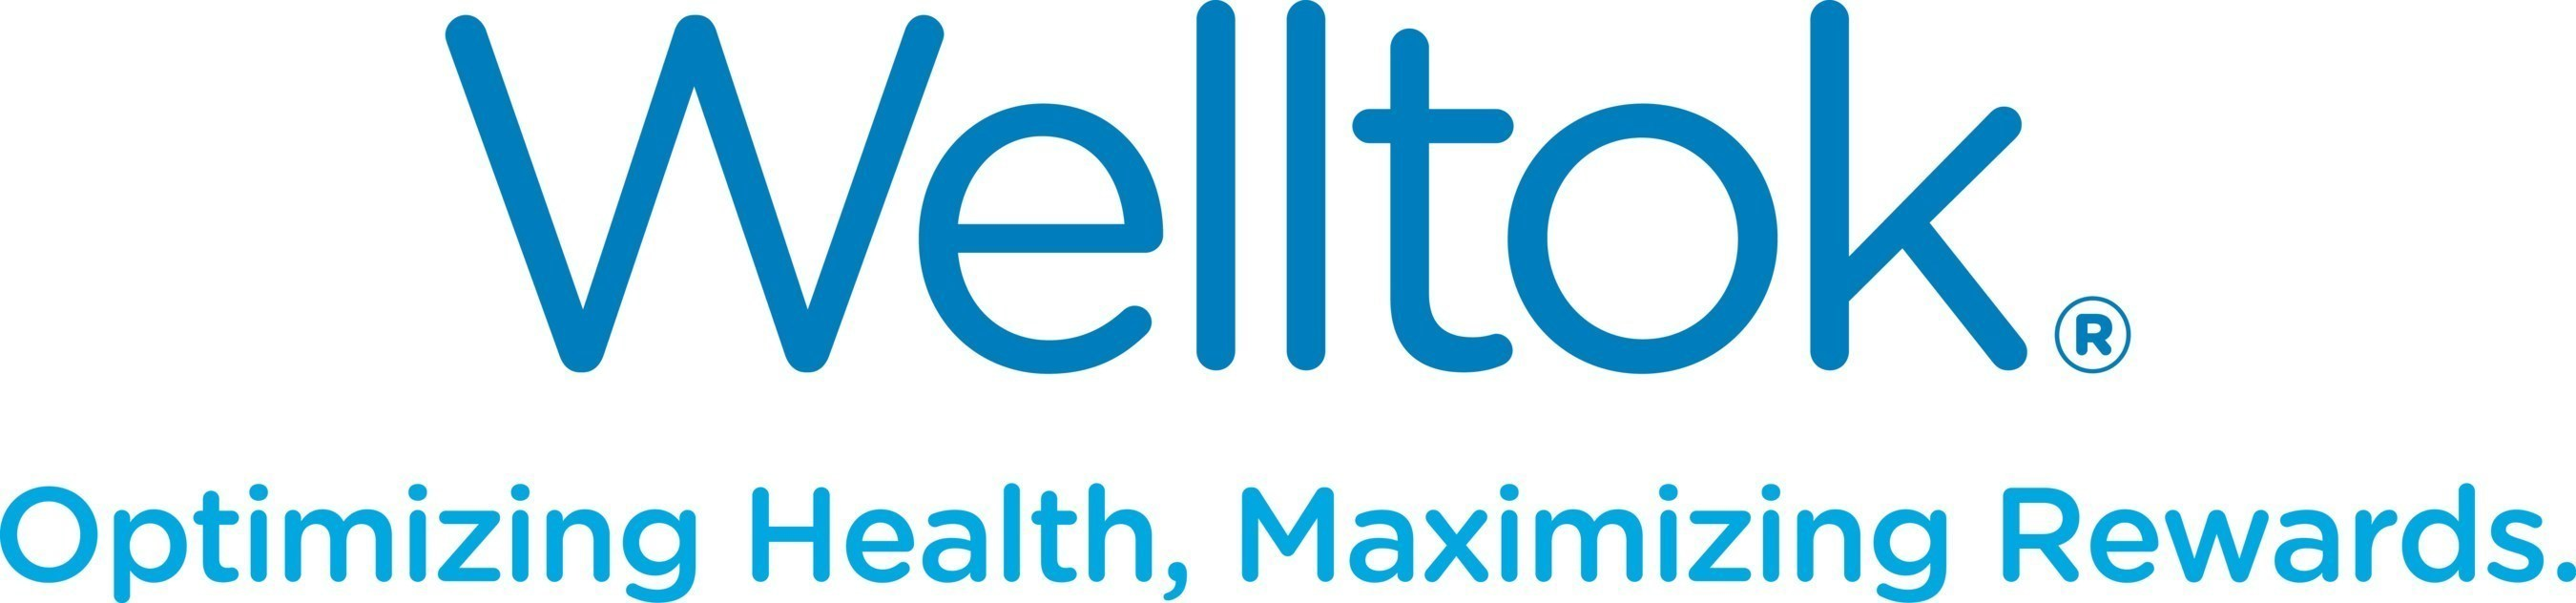 welltok logo